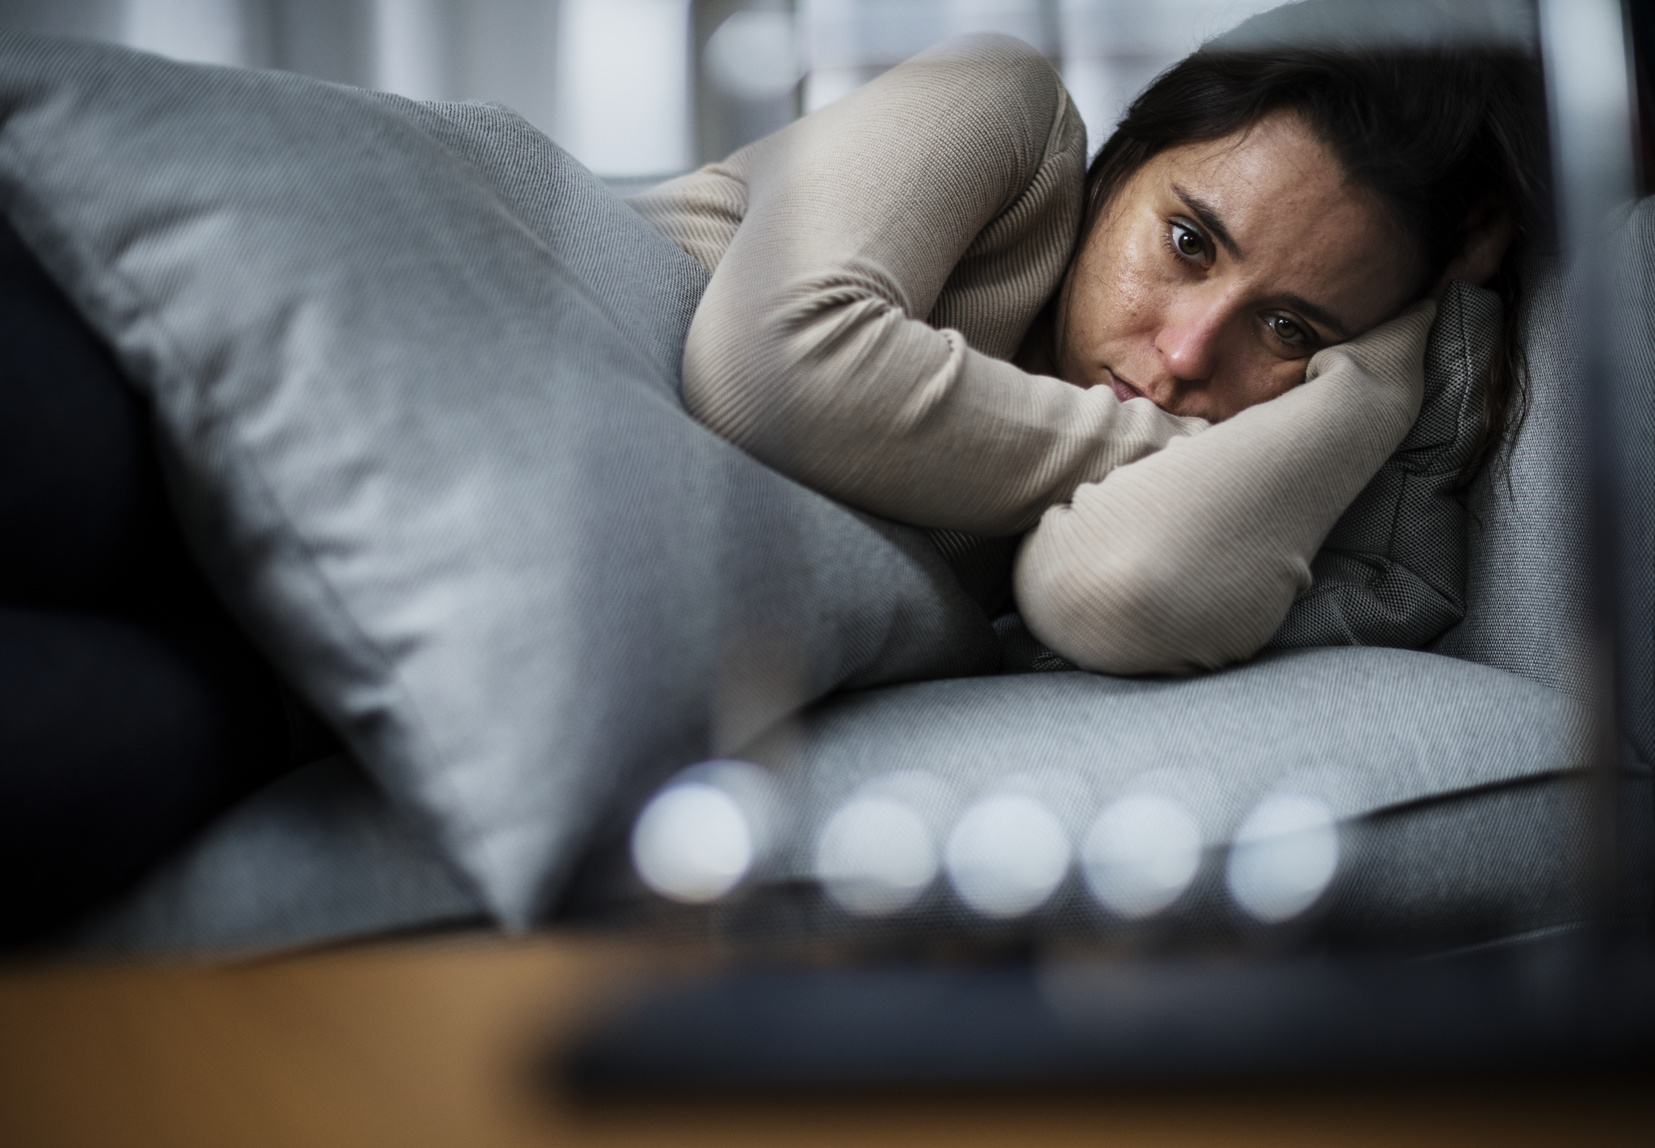 Endometrioza - historia Joanny